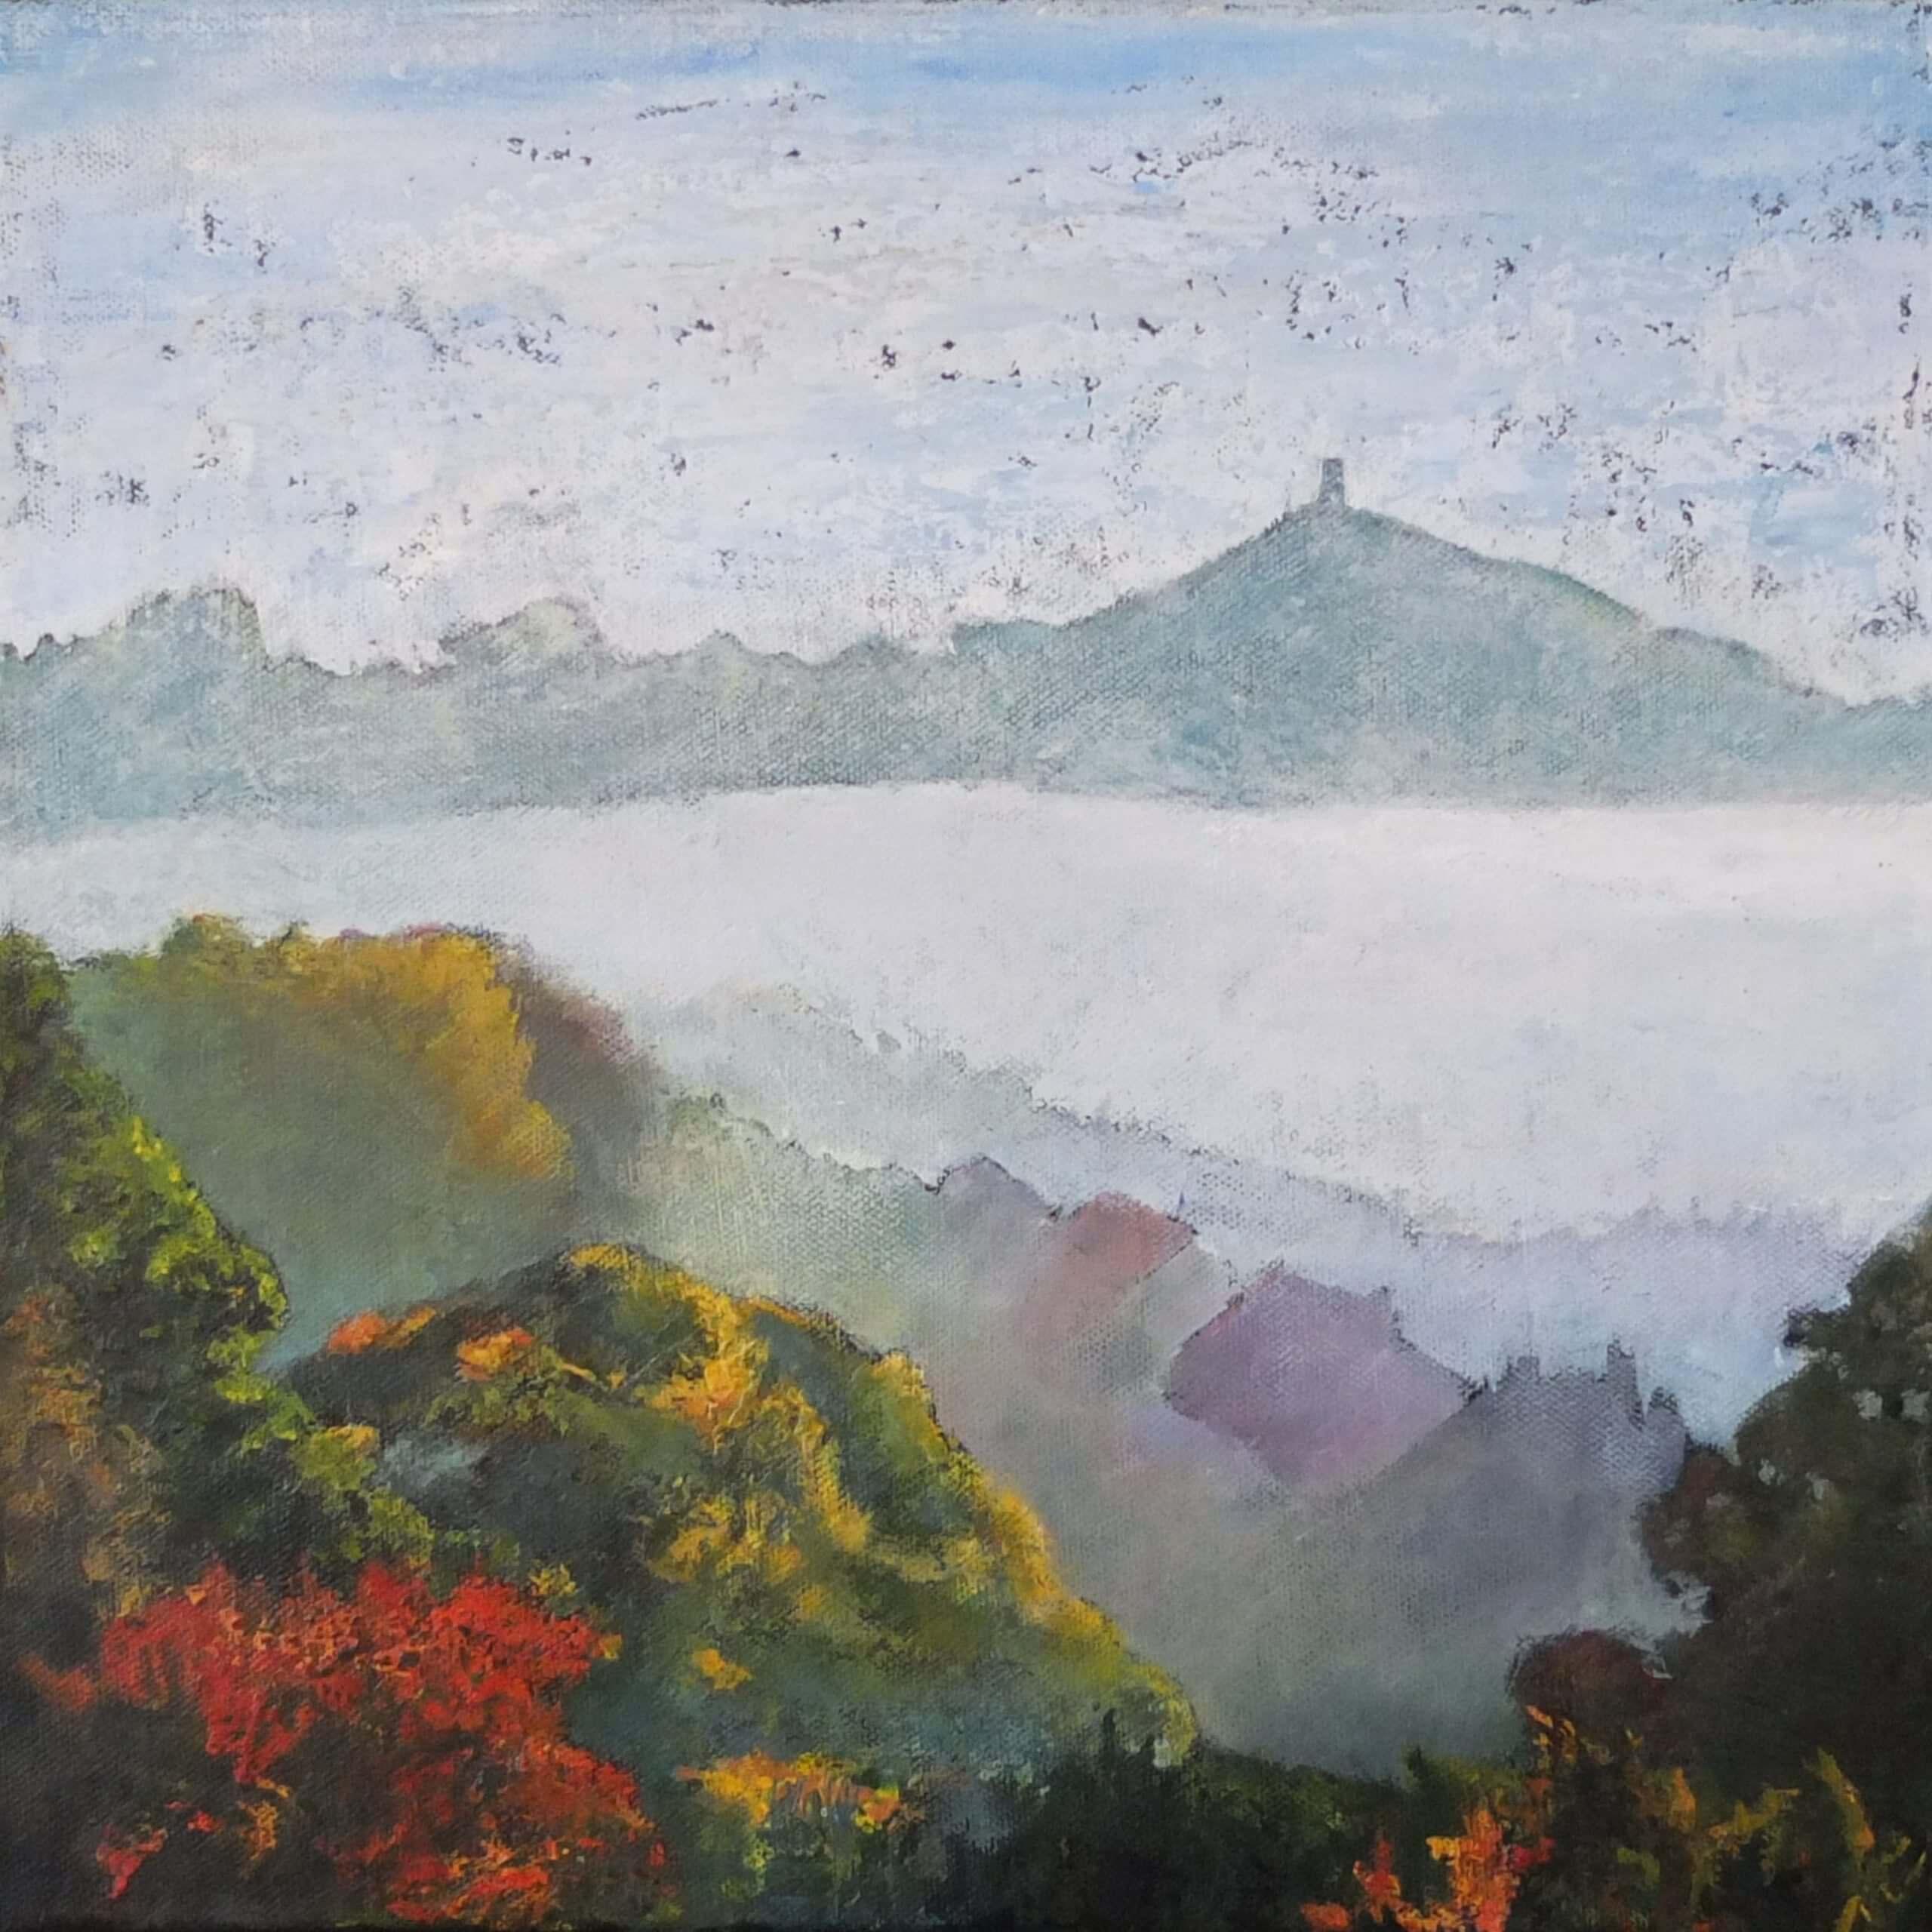 'Early Morning Mist', Glastonbury Tor